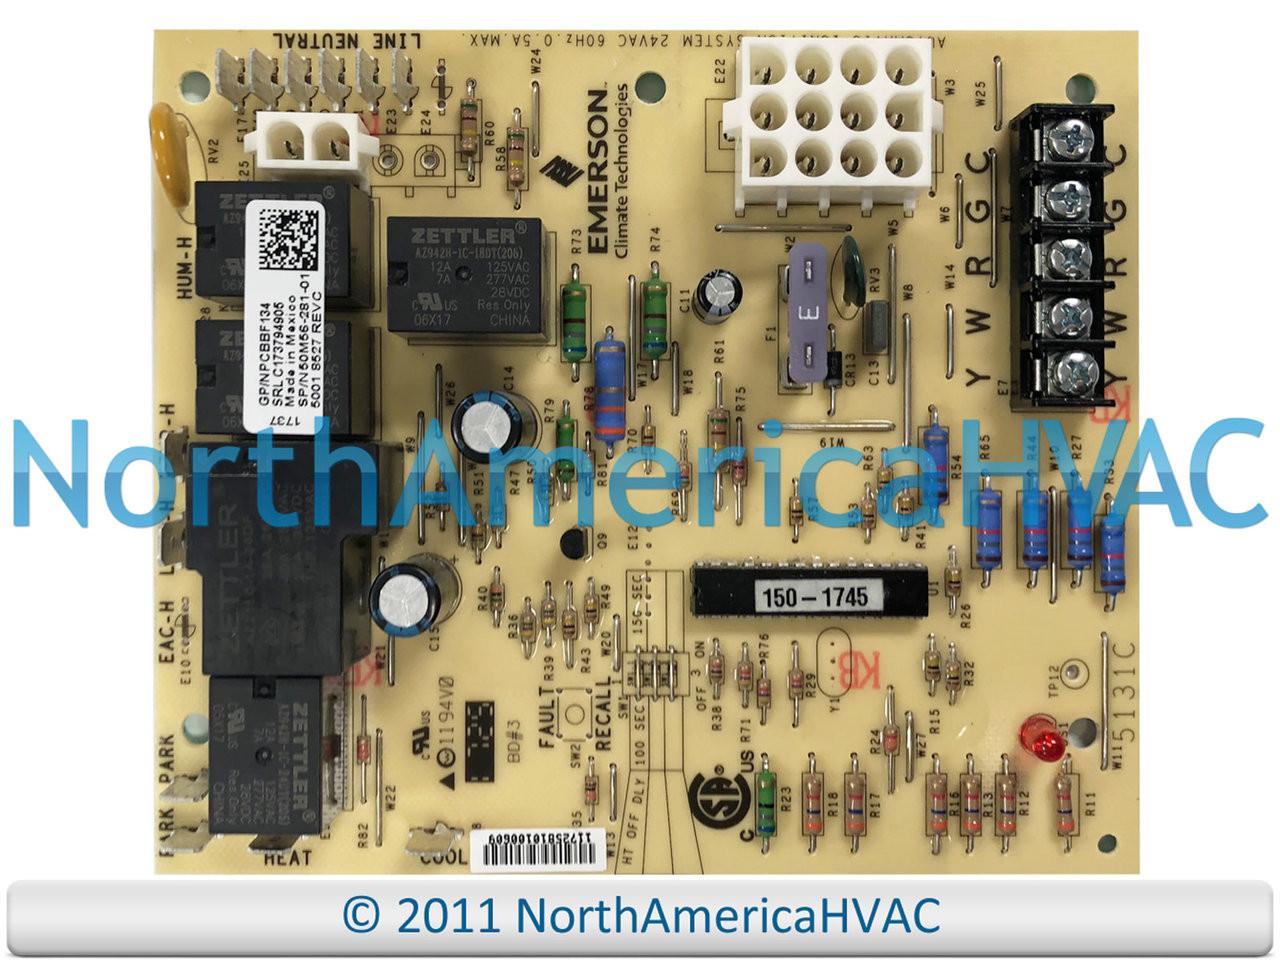 OEM Goodman Amana Furnace Control Circuit Board PCBBF138 PCBBF138S - North  America HVAC | Hvac Control Board Wiring |  | North America HVAC